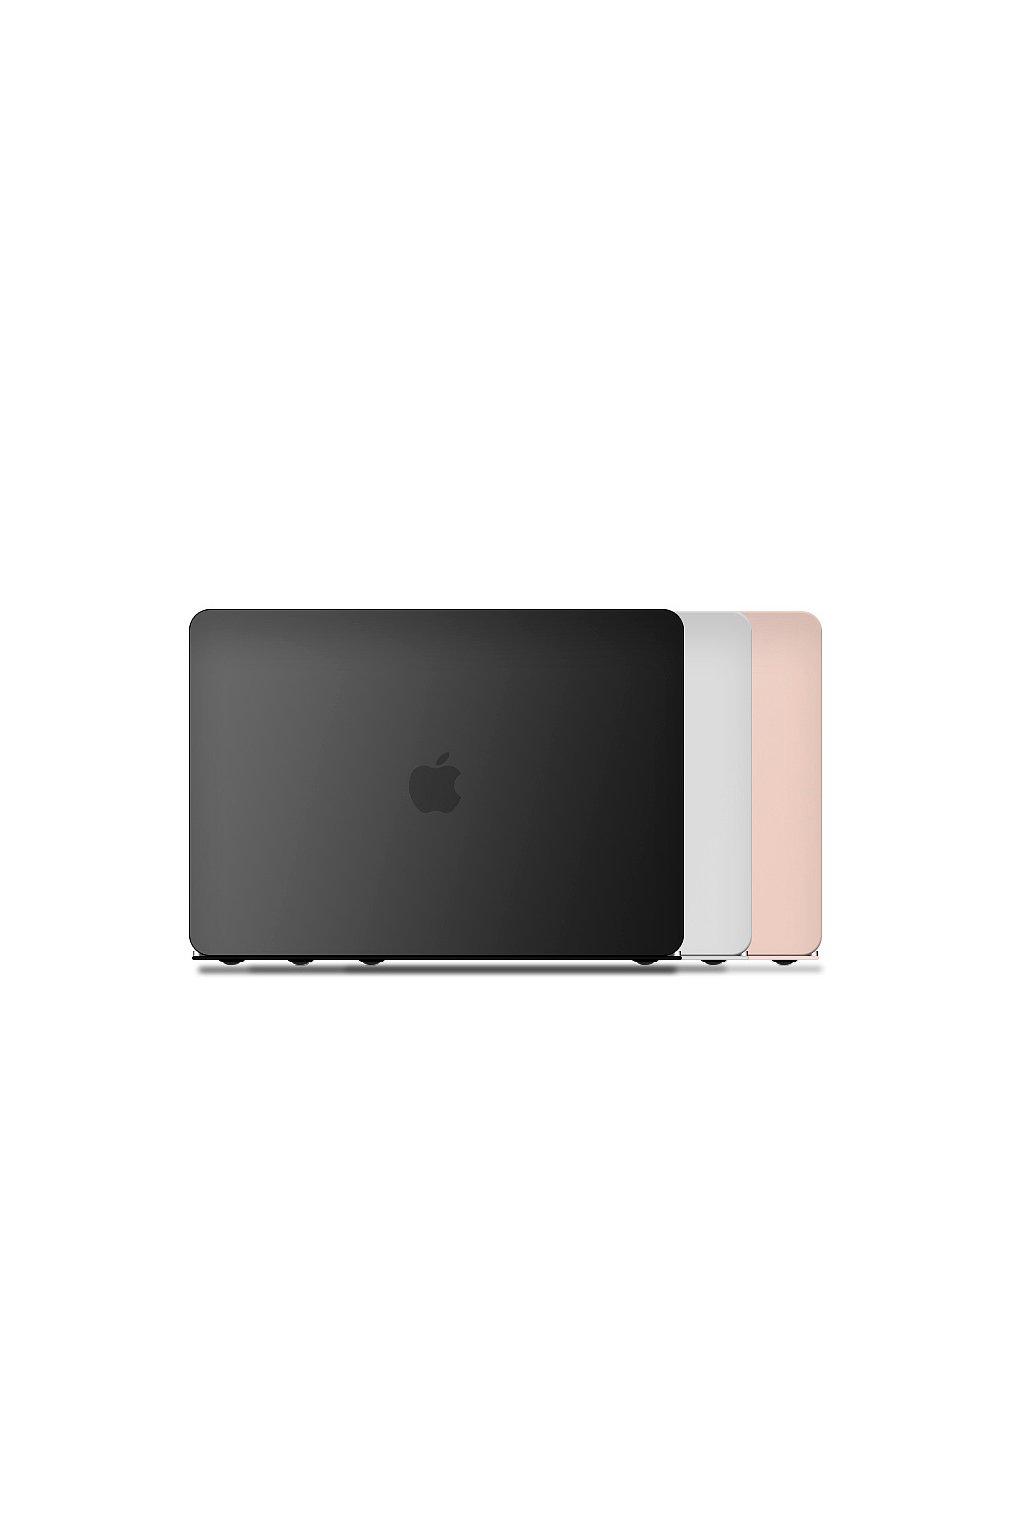 "WiWU iShield Ochrana pro Apple Macbook 12"""